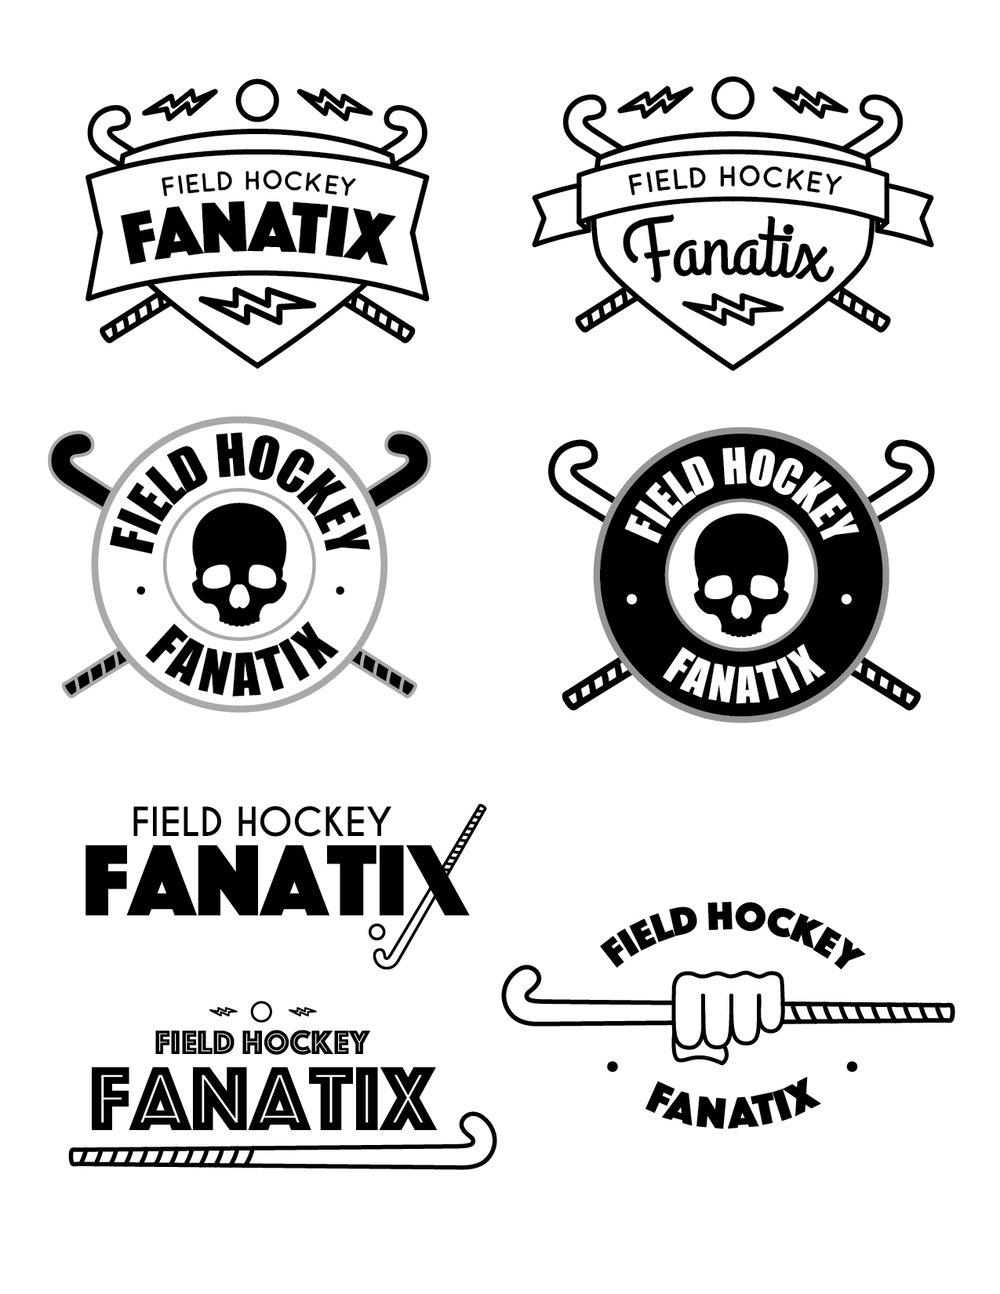 FieldHockeyFanatixLogoNew copy 3-03.jpg